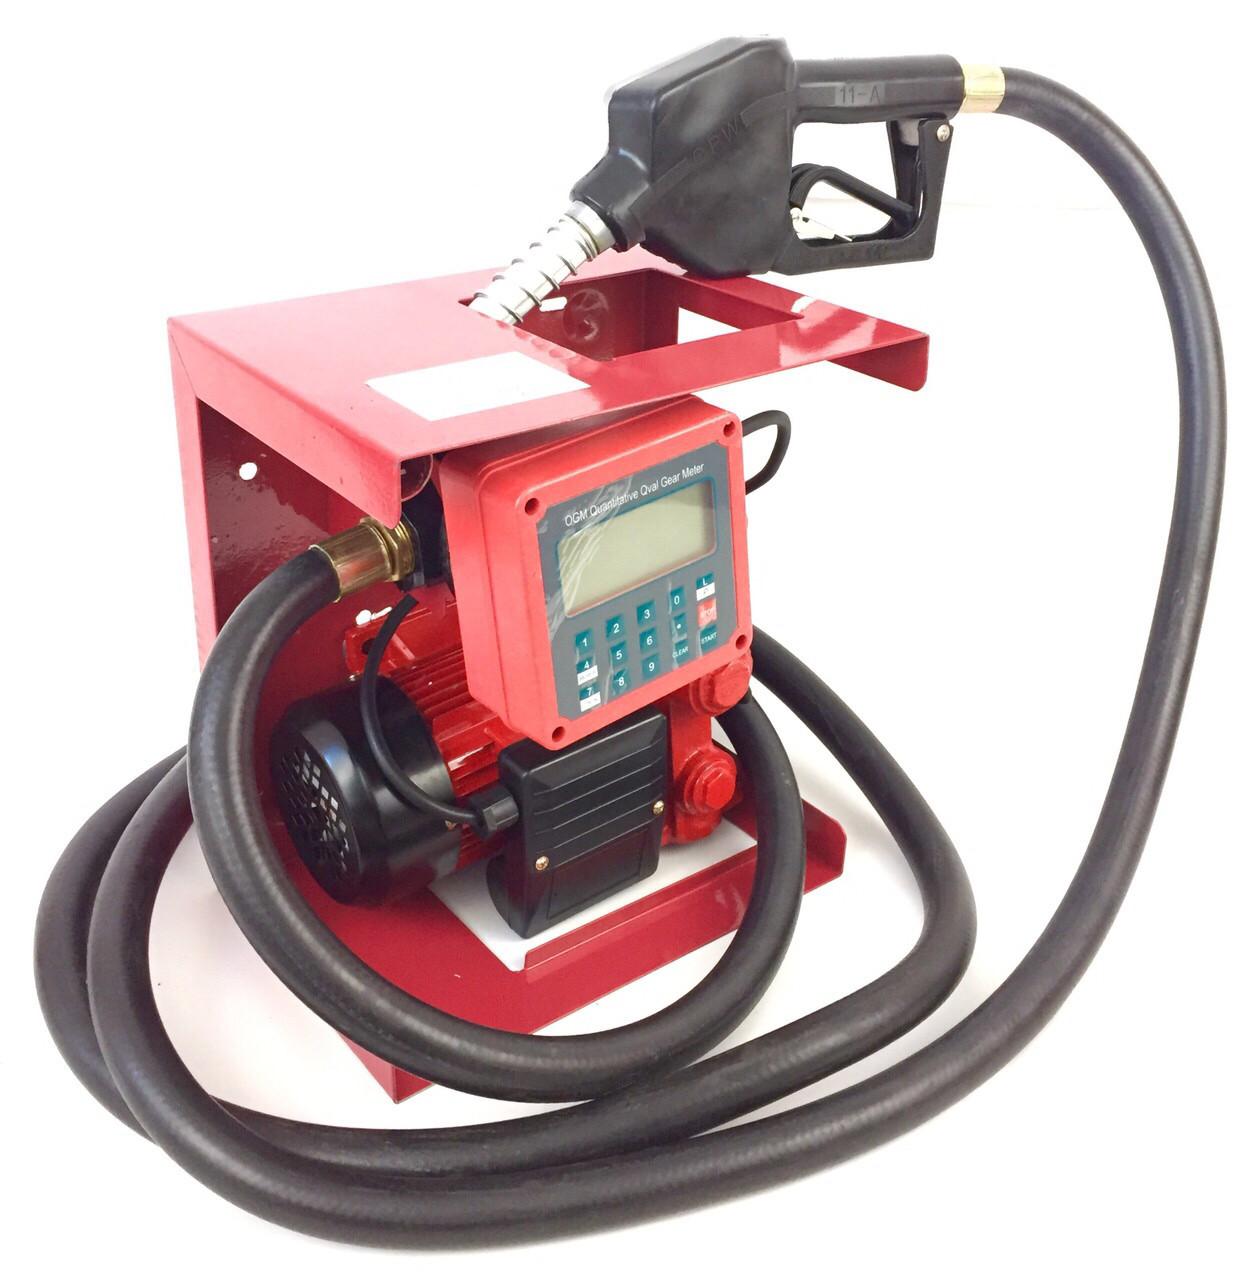 Топливная мини АЗС Euro Craft 220В 60л/мин с электронным счетчиком (ACFD40-2)